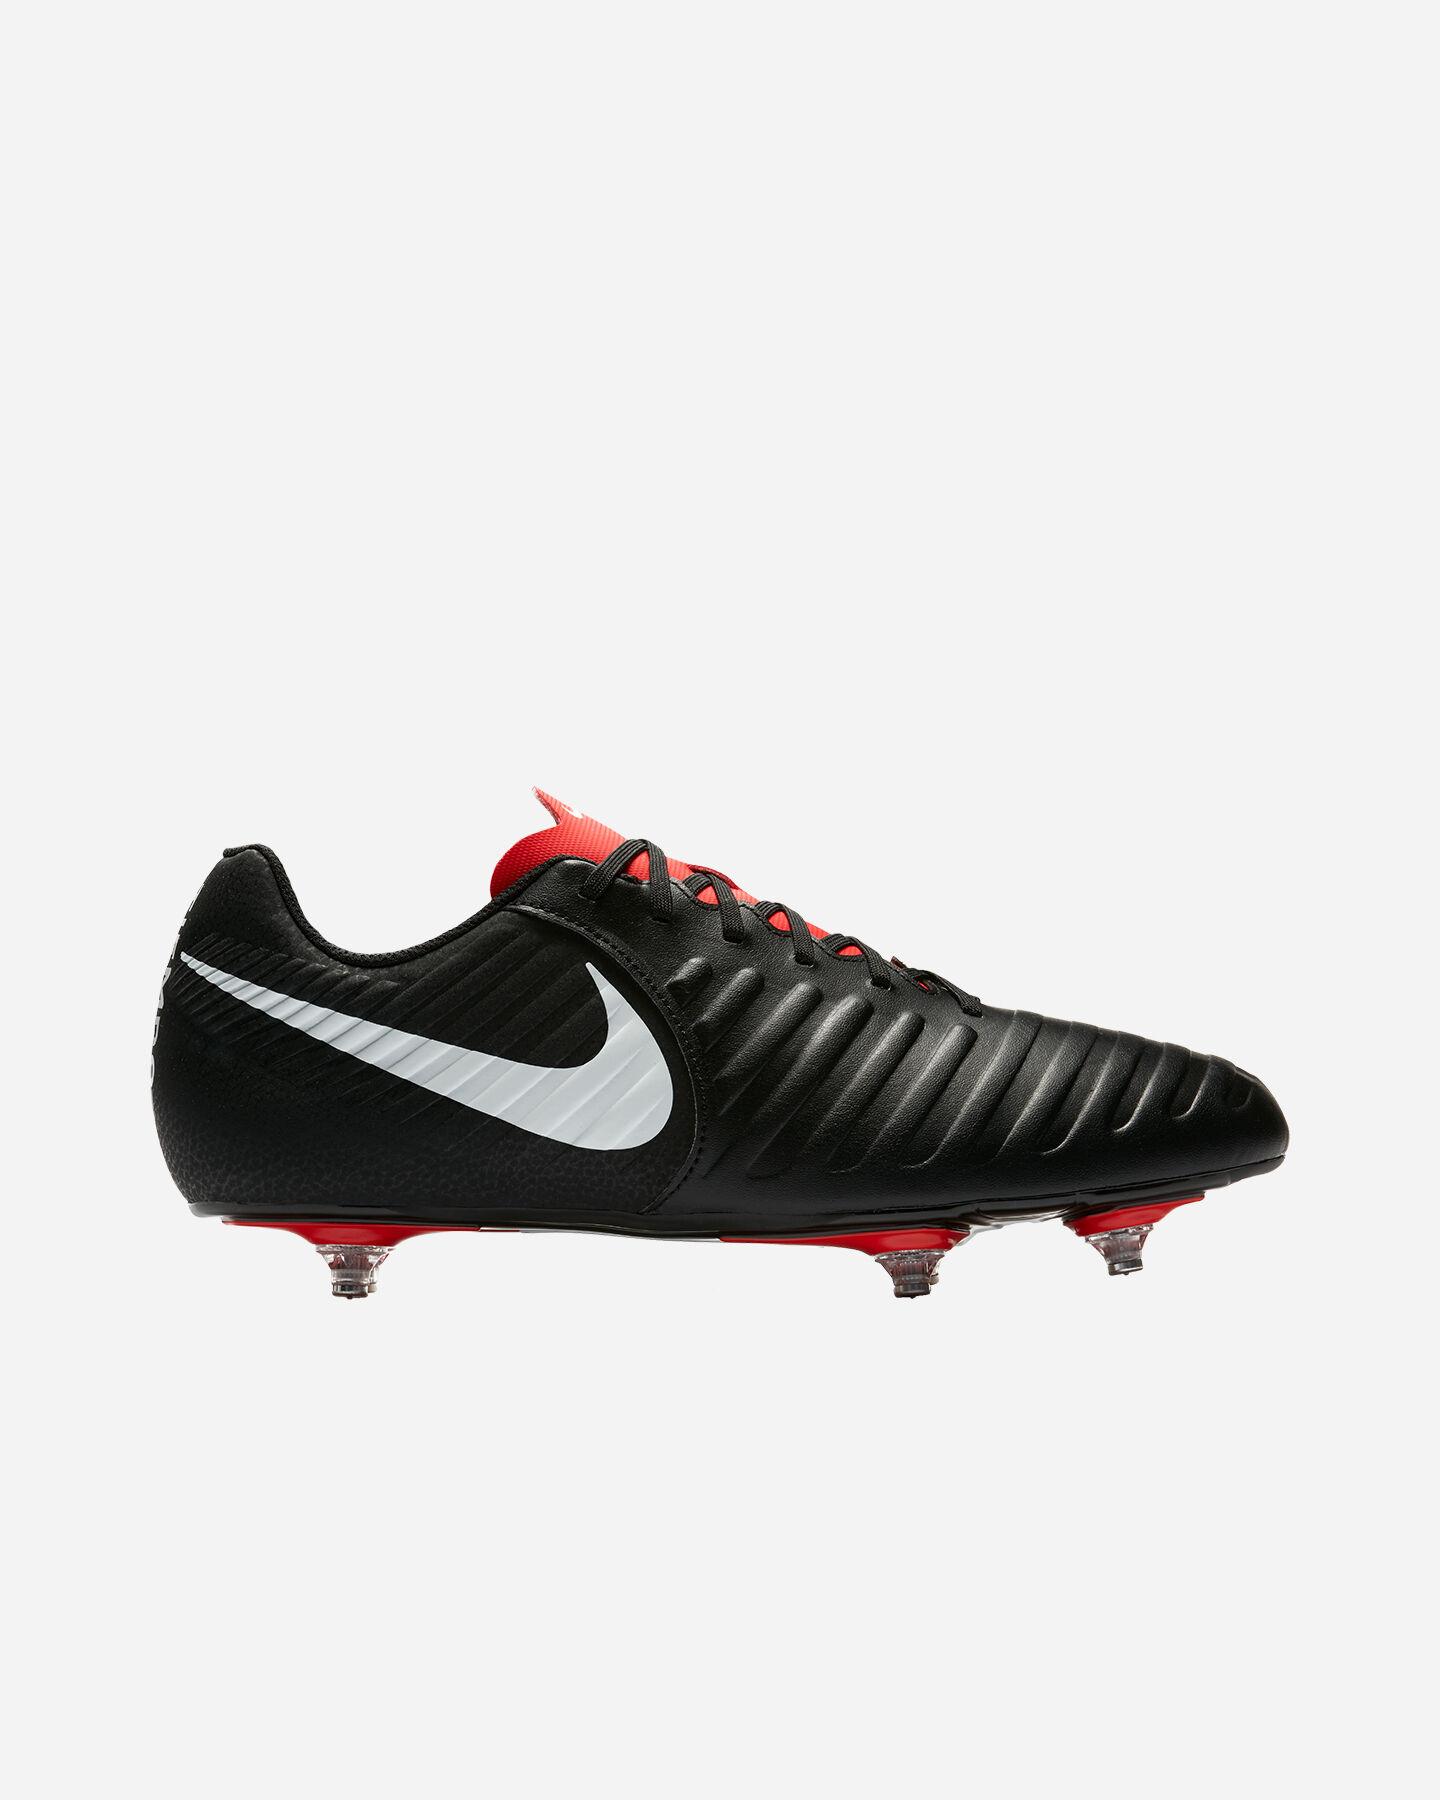 sports shoes 8d69c e6dfa Legend Scarpe Ah8800 Su 7 006 Tiempo Cisalfa M Sg Nike Club Calcio f5R7nwq